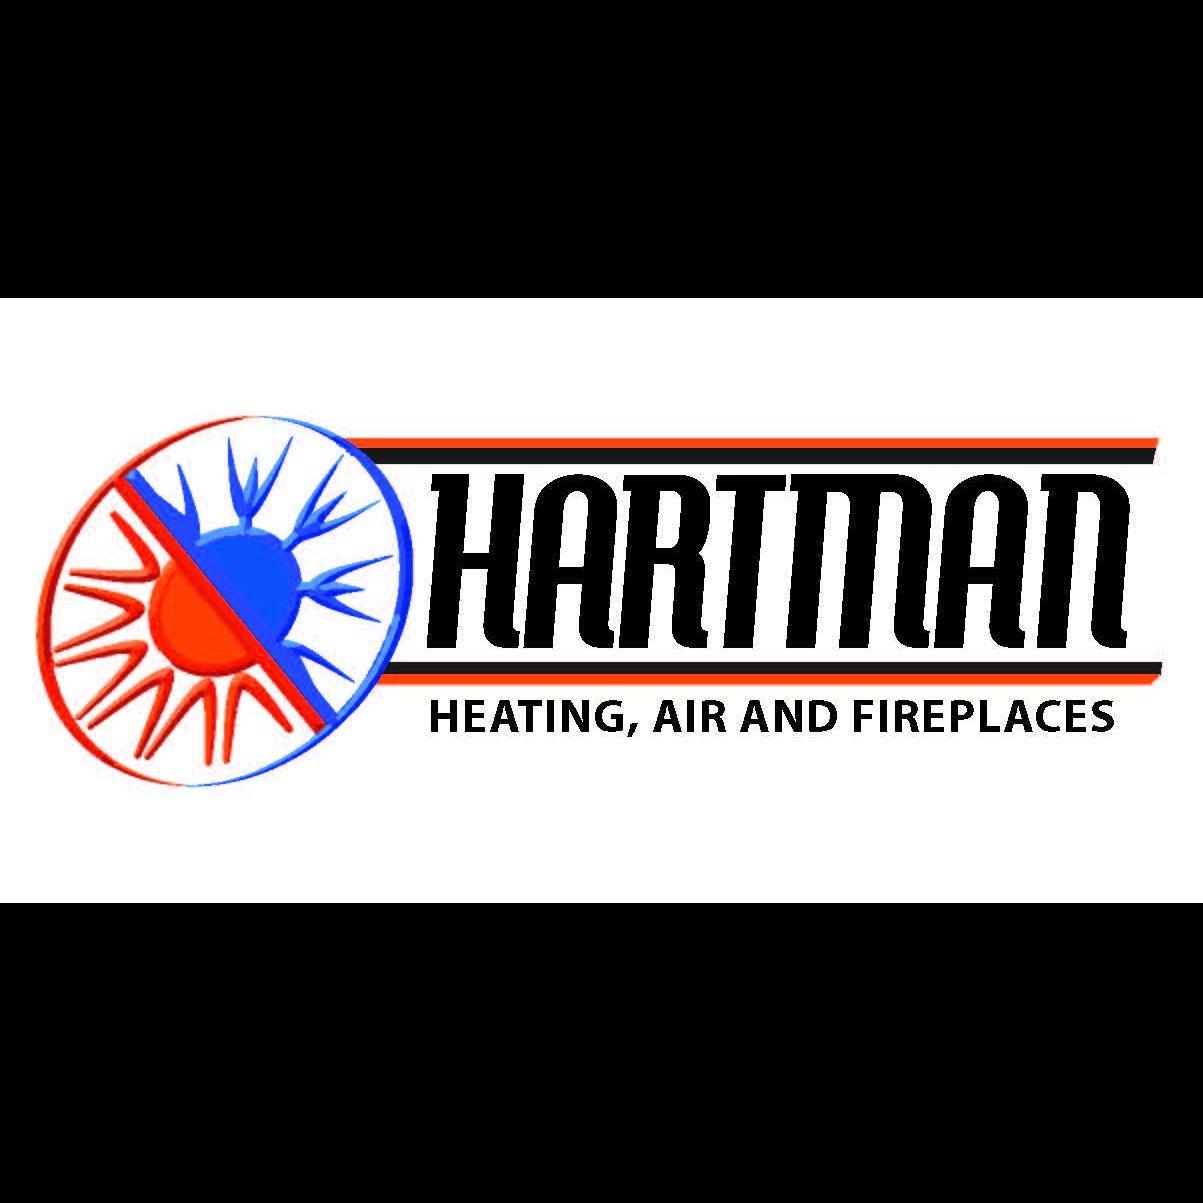 Hartman Heating